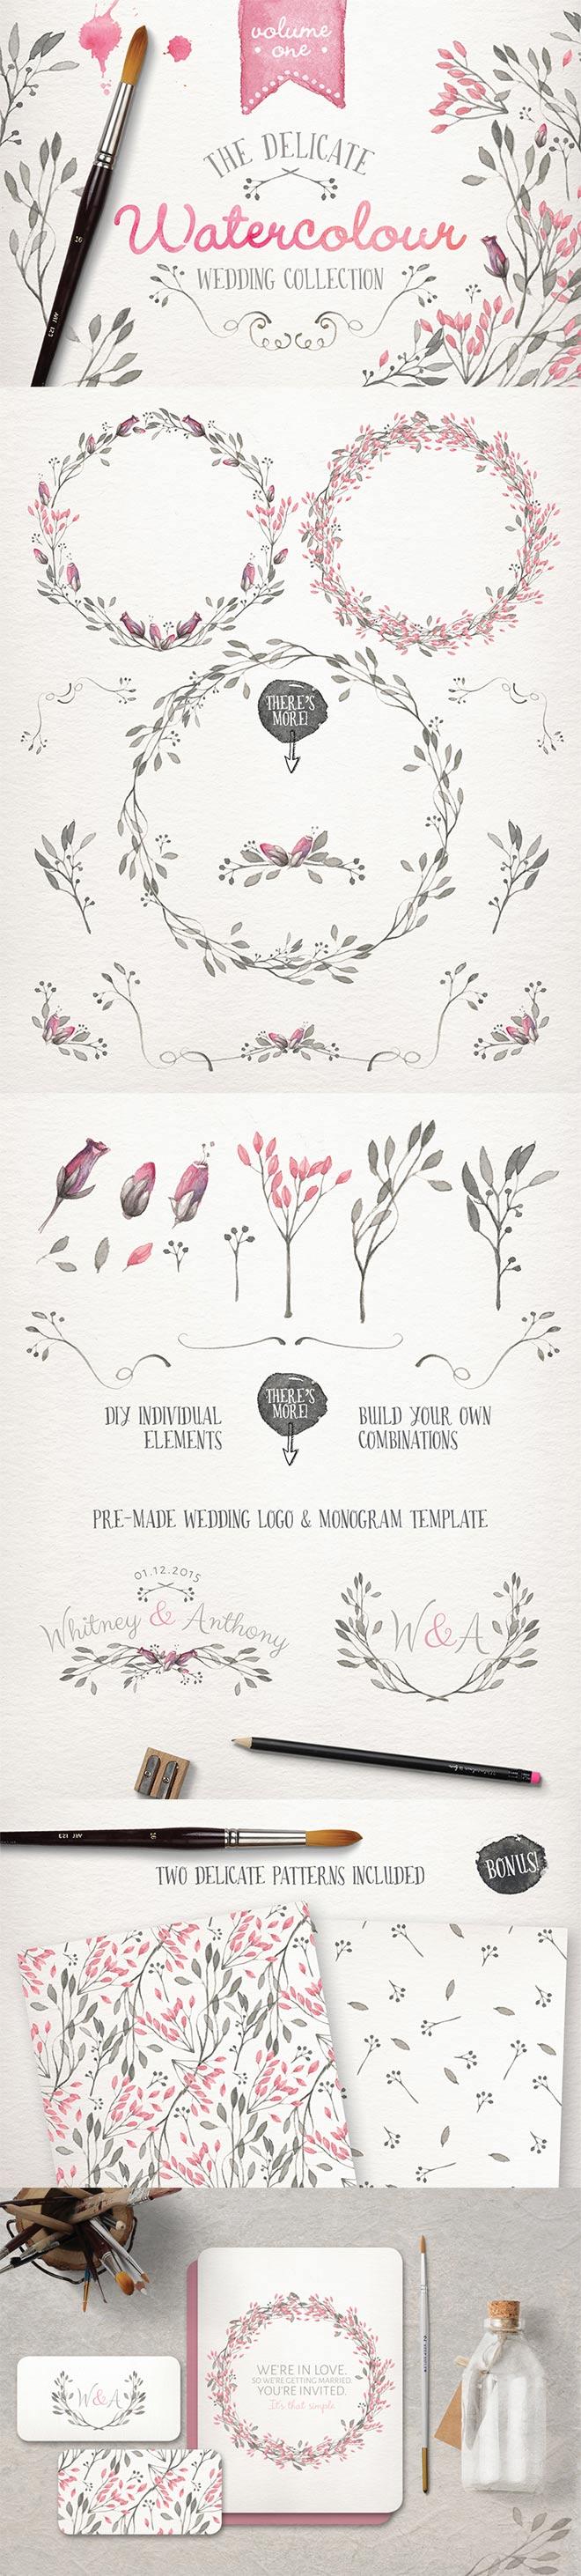 Watercolor Wedding Collection